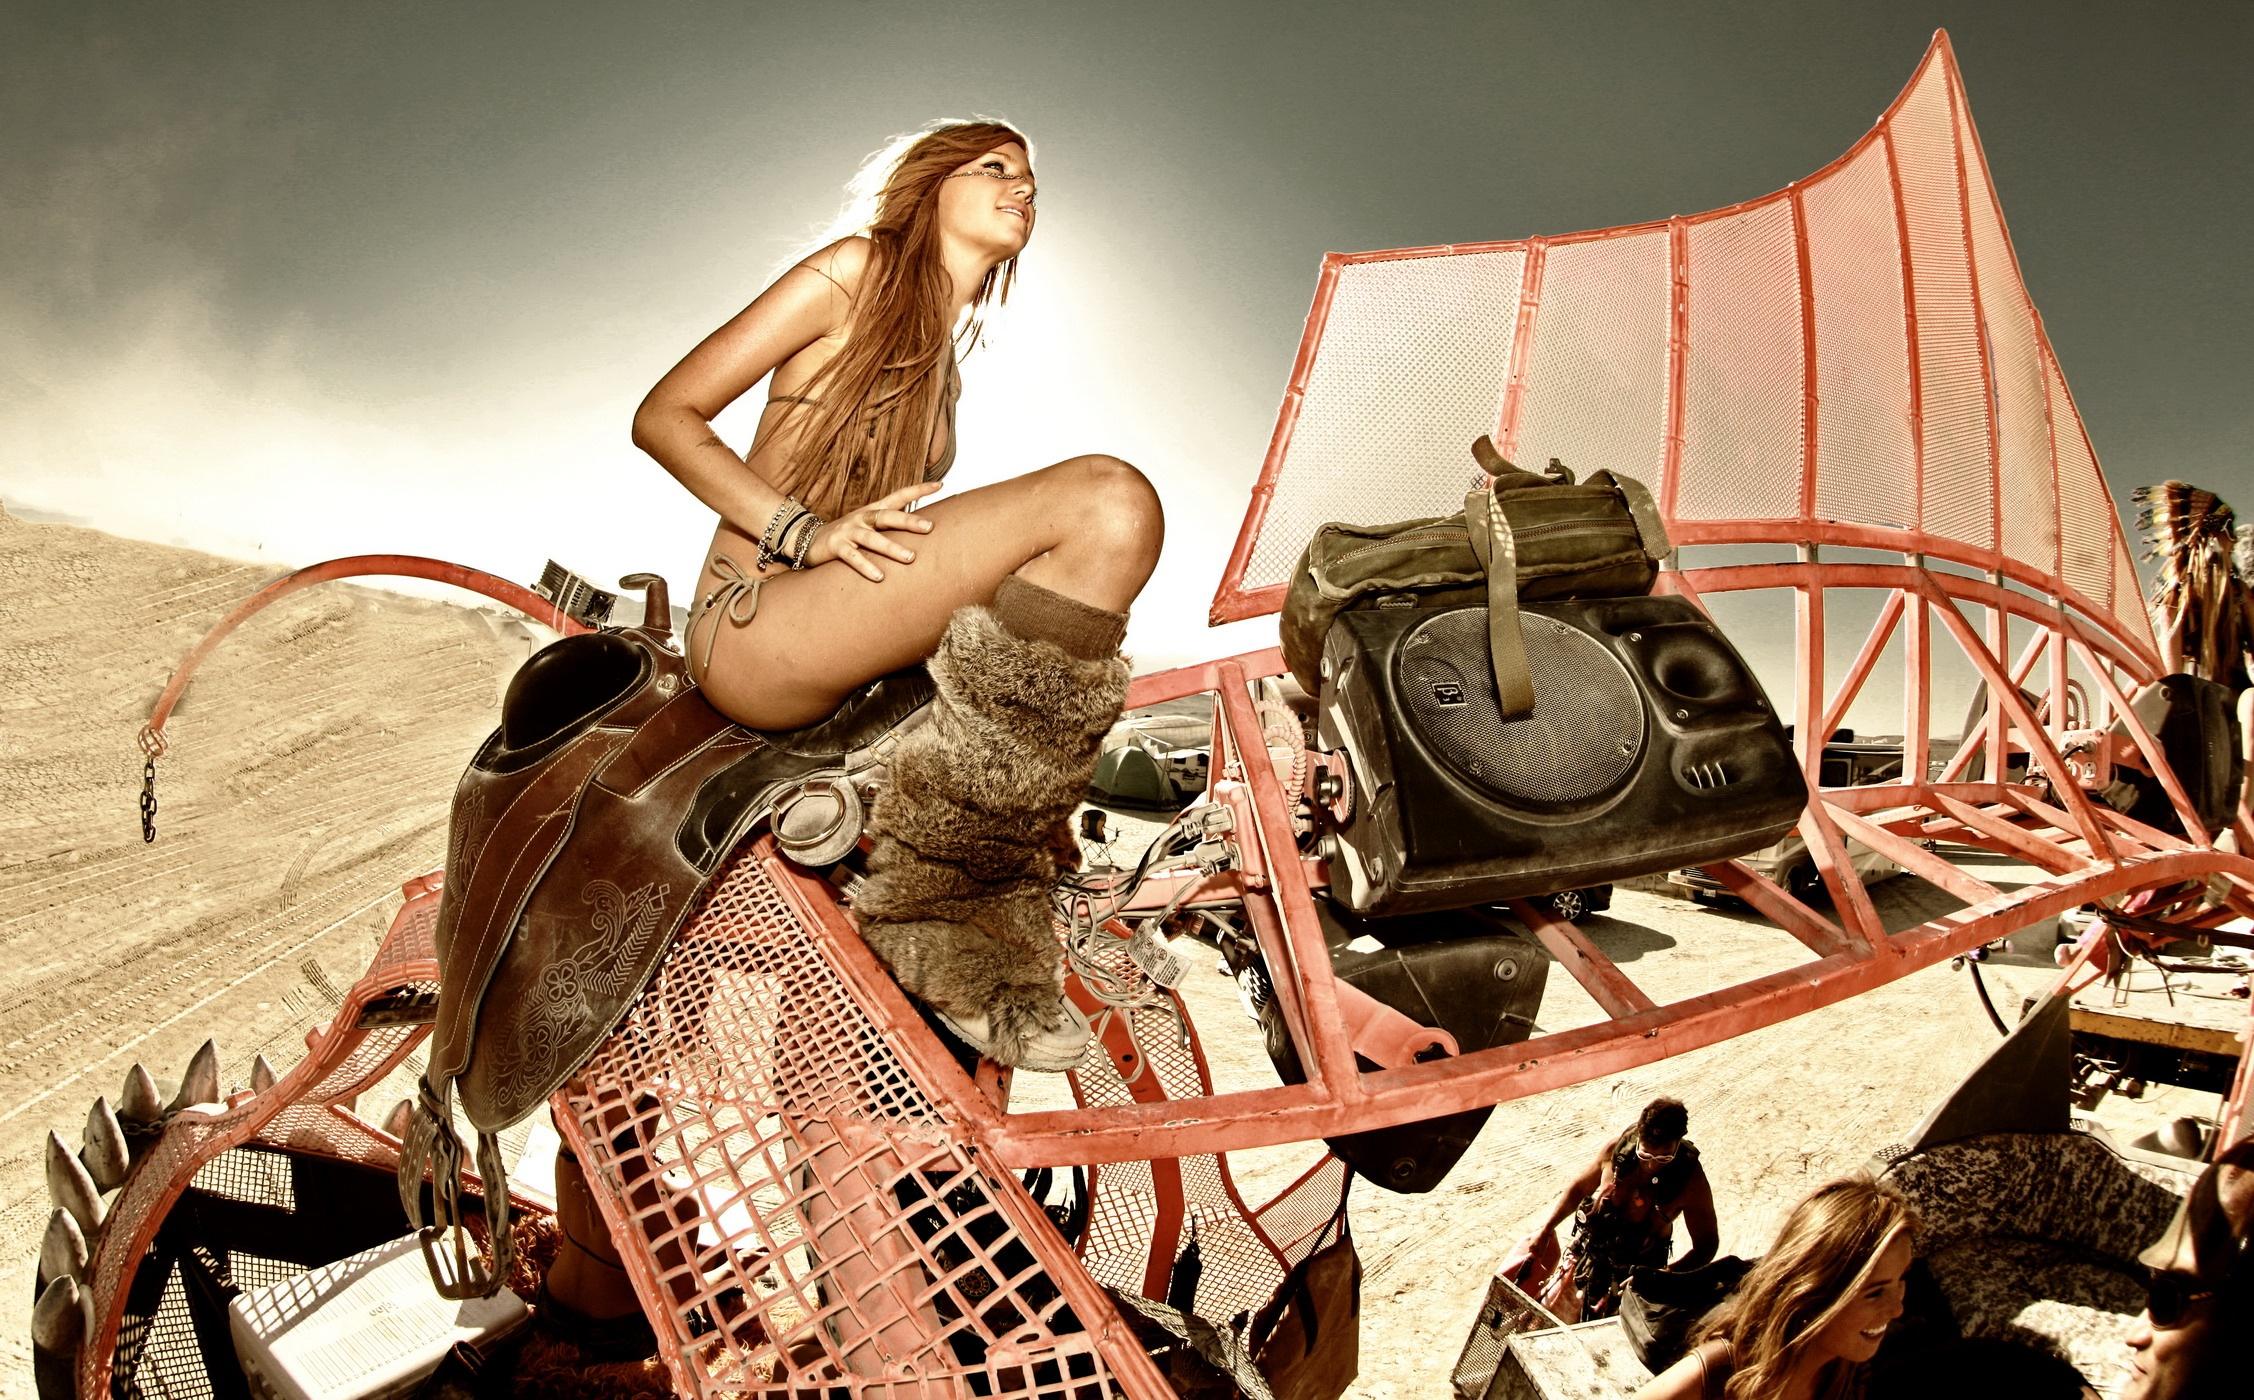 Tomas-Loewy-Burning-Man-2011-Highlights-pre-selection-138-.jpg